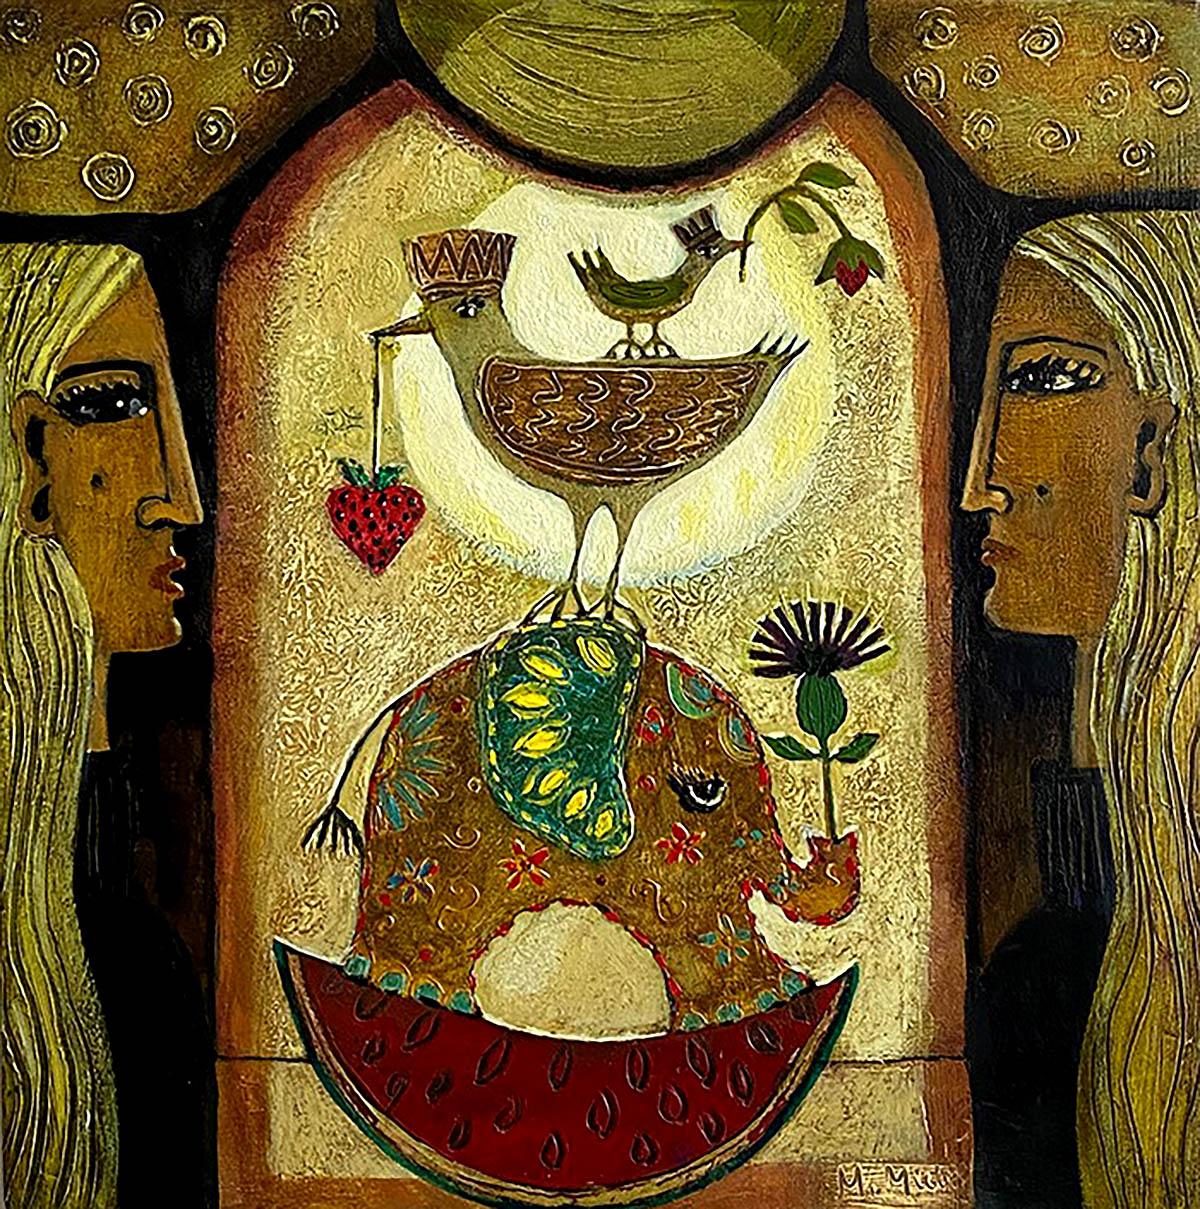 Morag Muir, 'Social Distance', acrylic on board